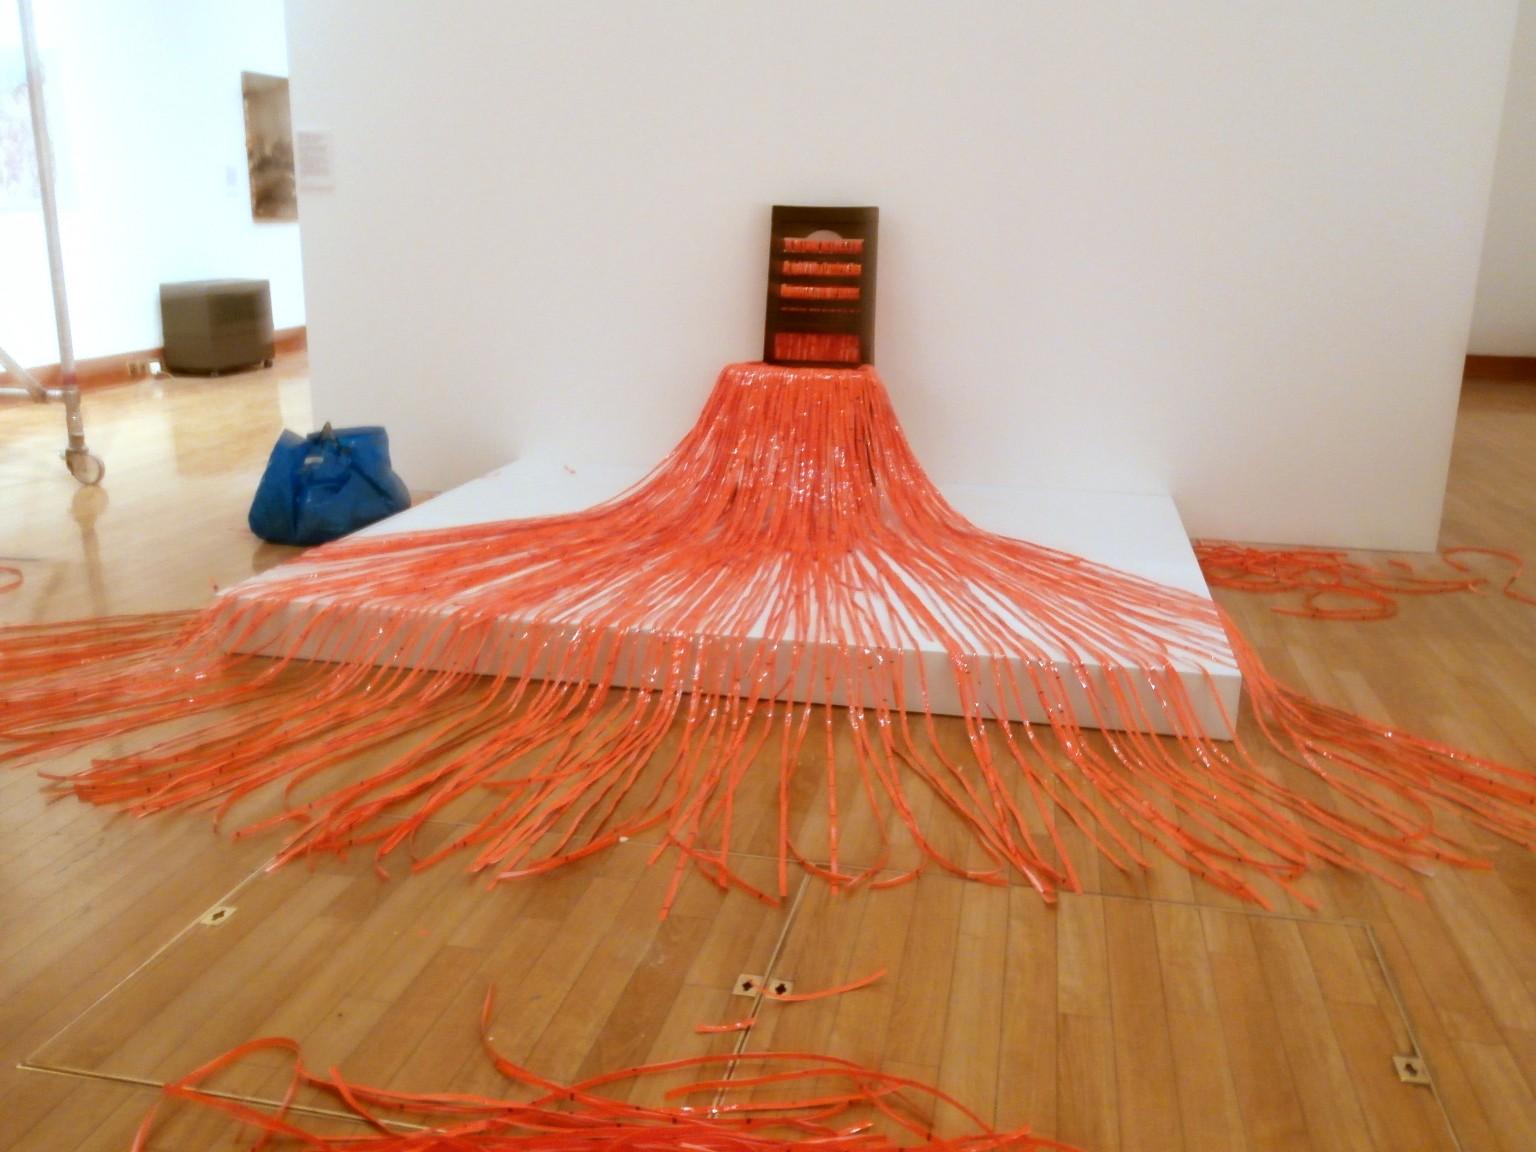 Untitled (Chair & Plastic), 2012. Sikander Pervez. New Art West Midlands 2014